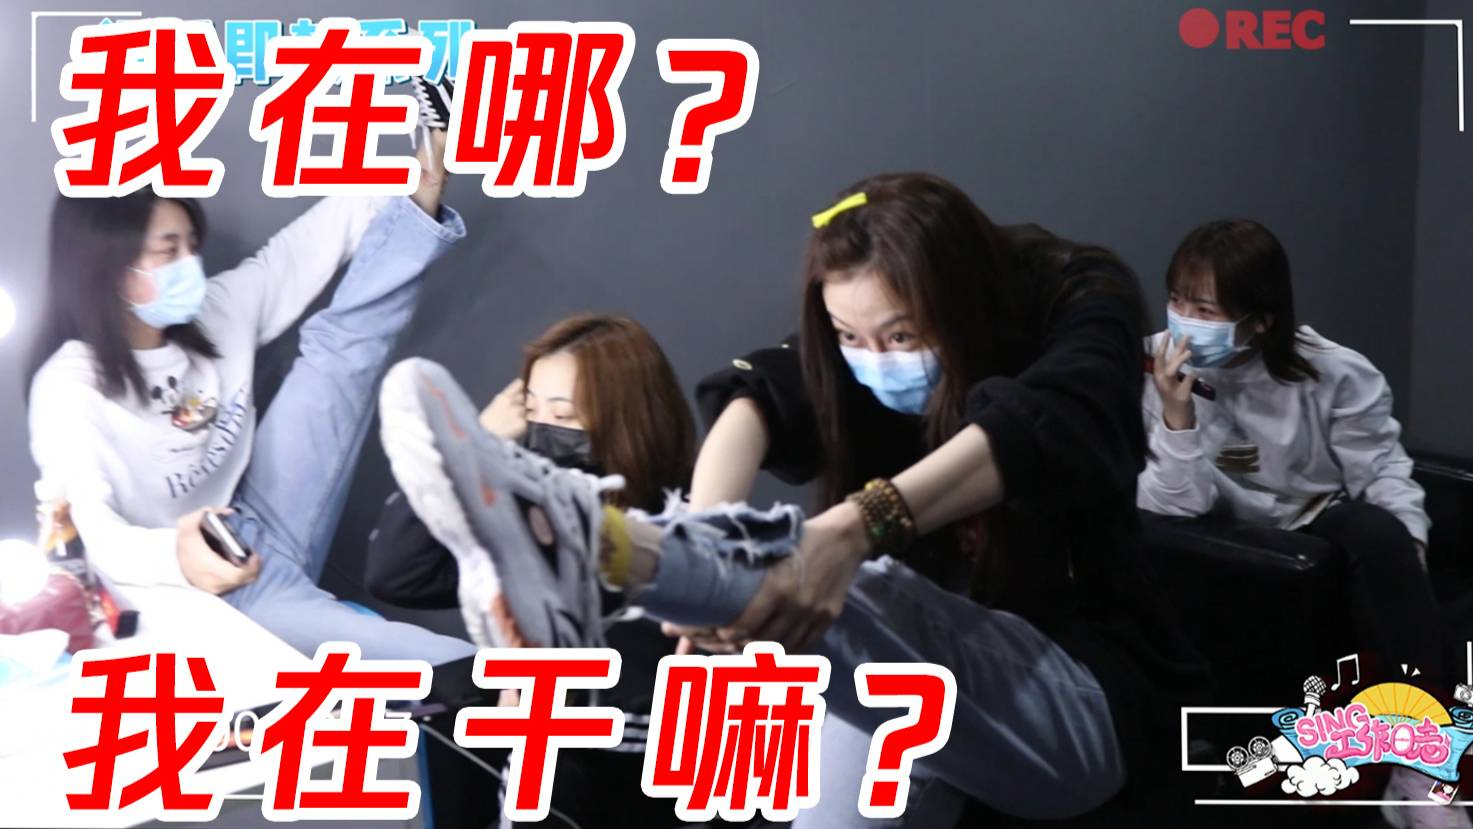 【SING女团】工作日志64:寄明月舞台的幕后花絮~每次彩排为啥要拍视频,原因竟然是...